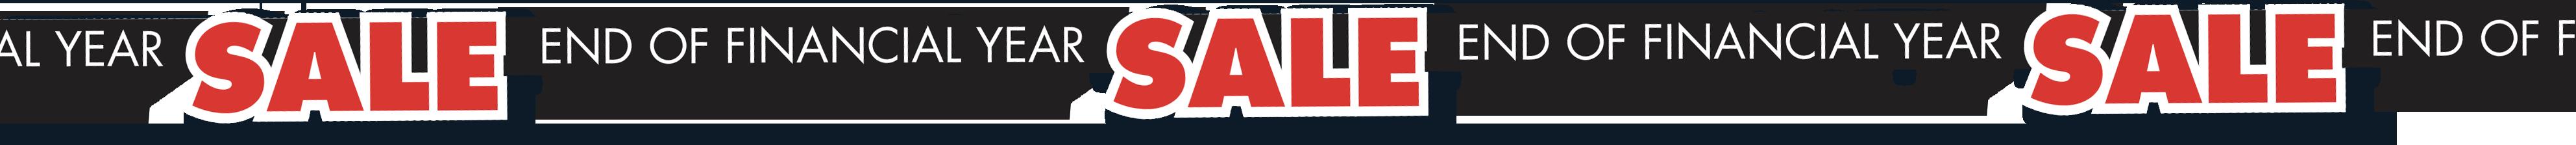 banner-sale-image